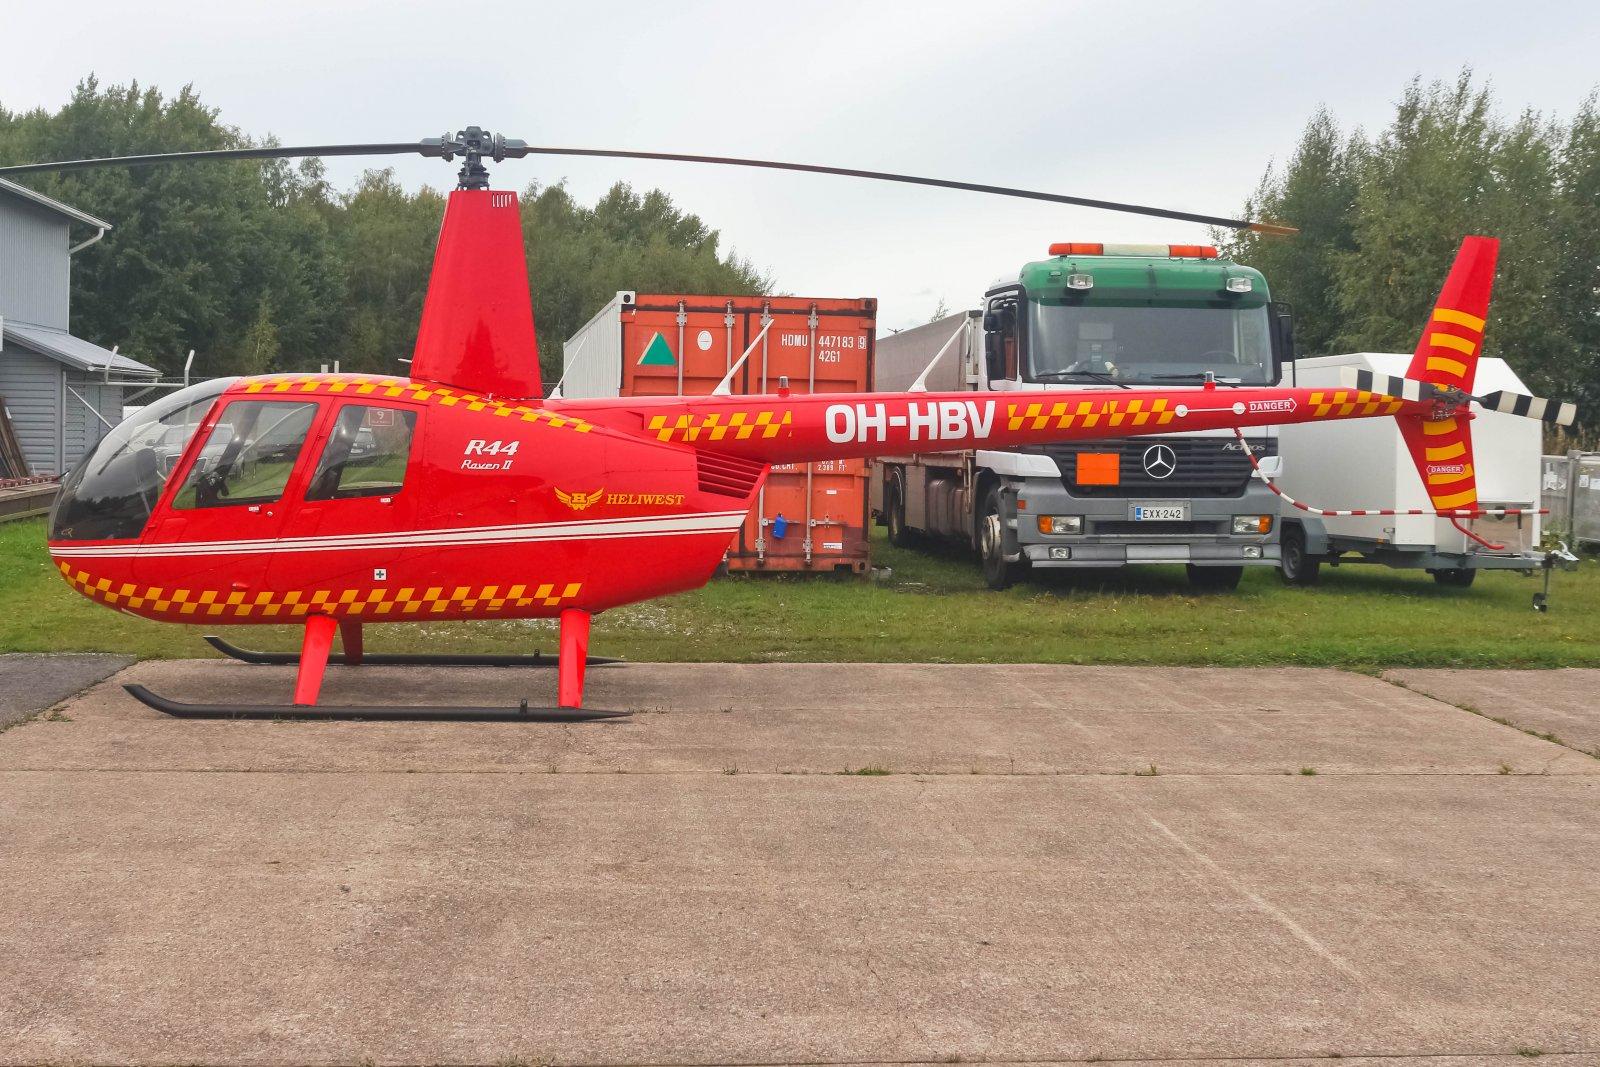 OH-HBV 18.09